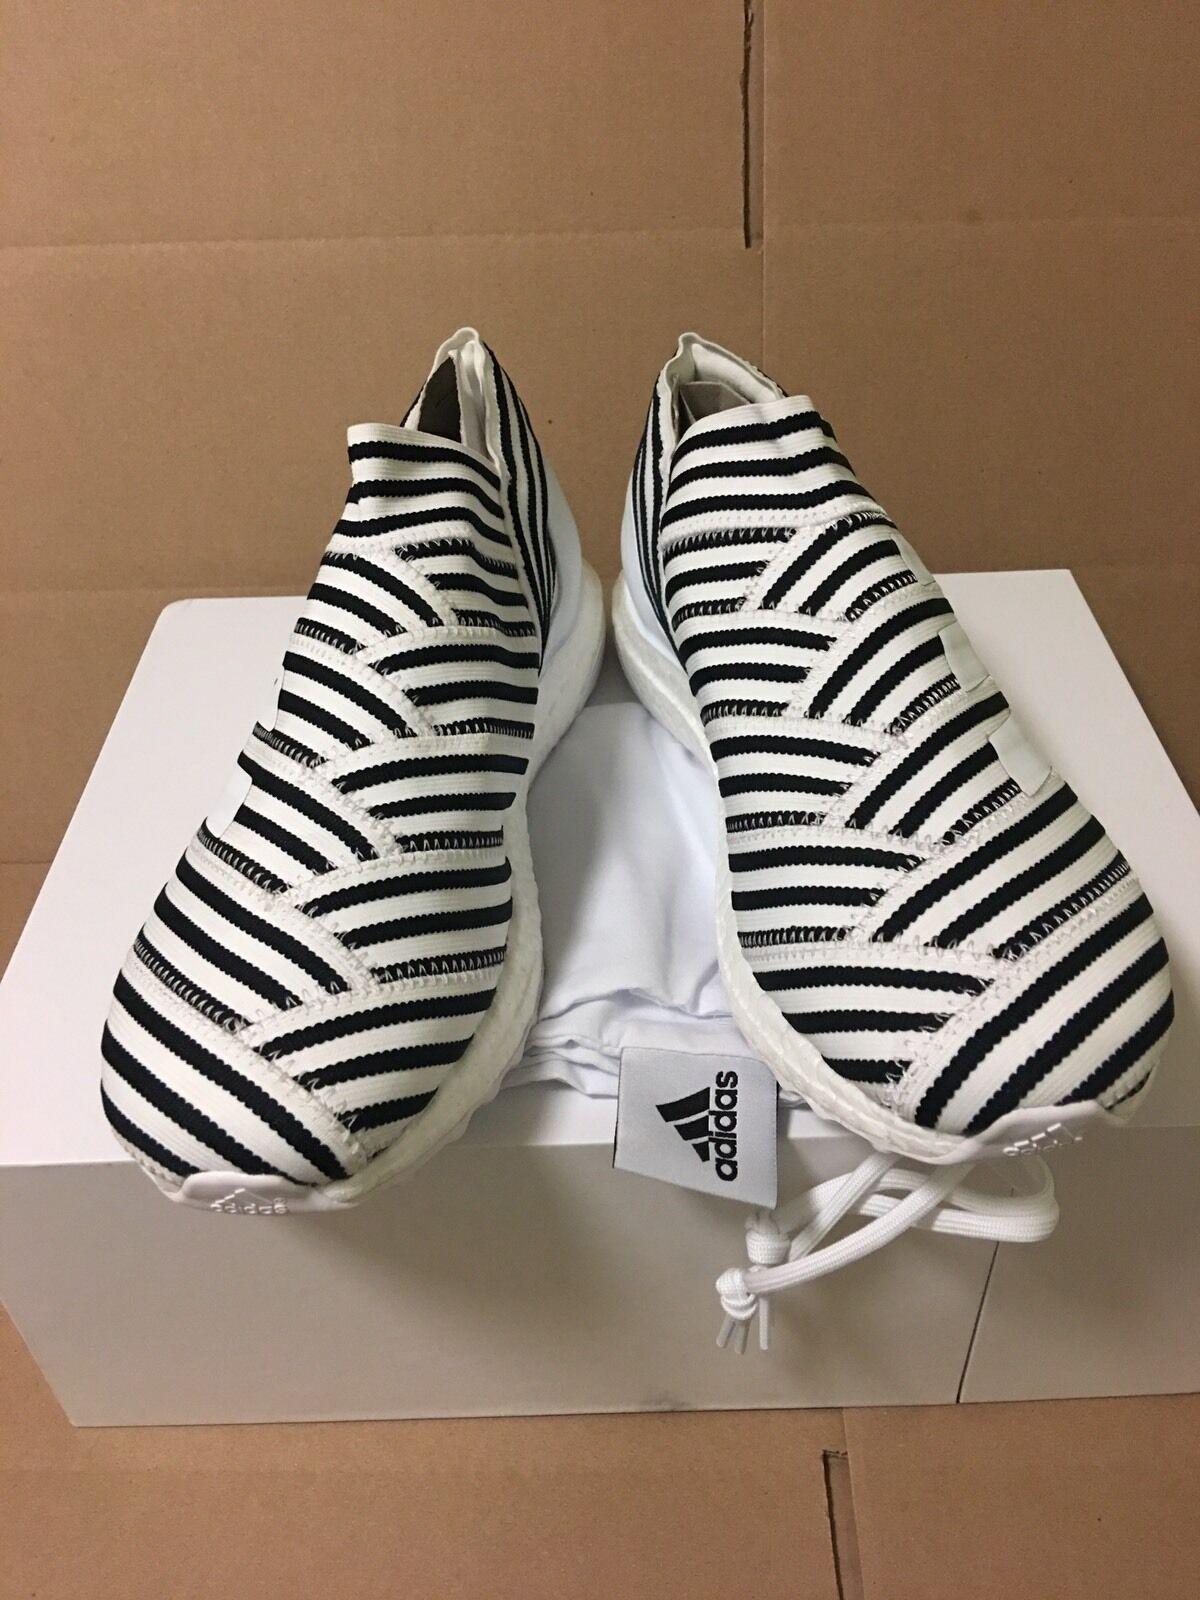 New Adidas Nemeziz Tango 17+ 360 Agility Ultra Boost Zebra size 9.5 US Sneakers